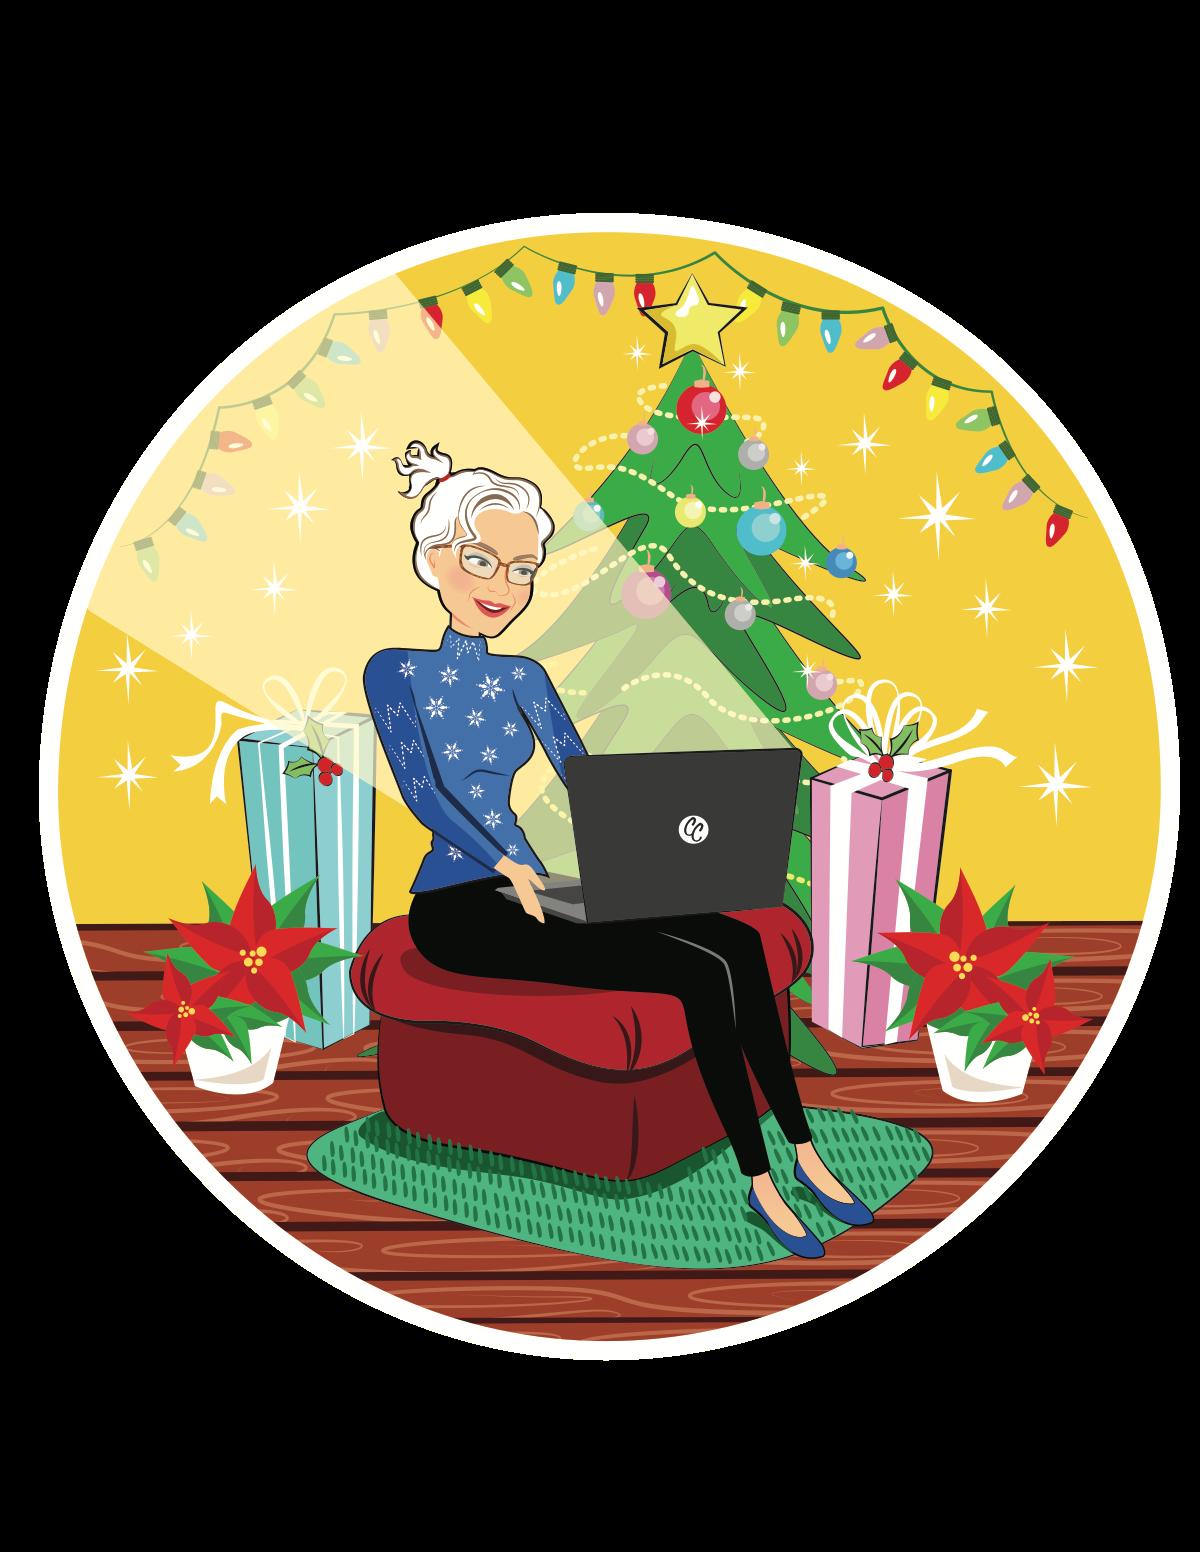 Chasing Christmas site logo/banner